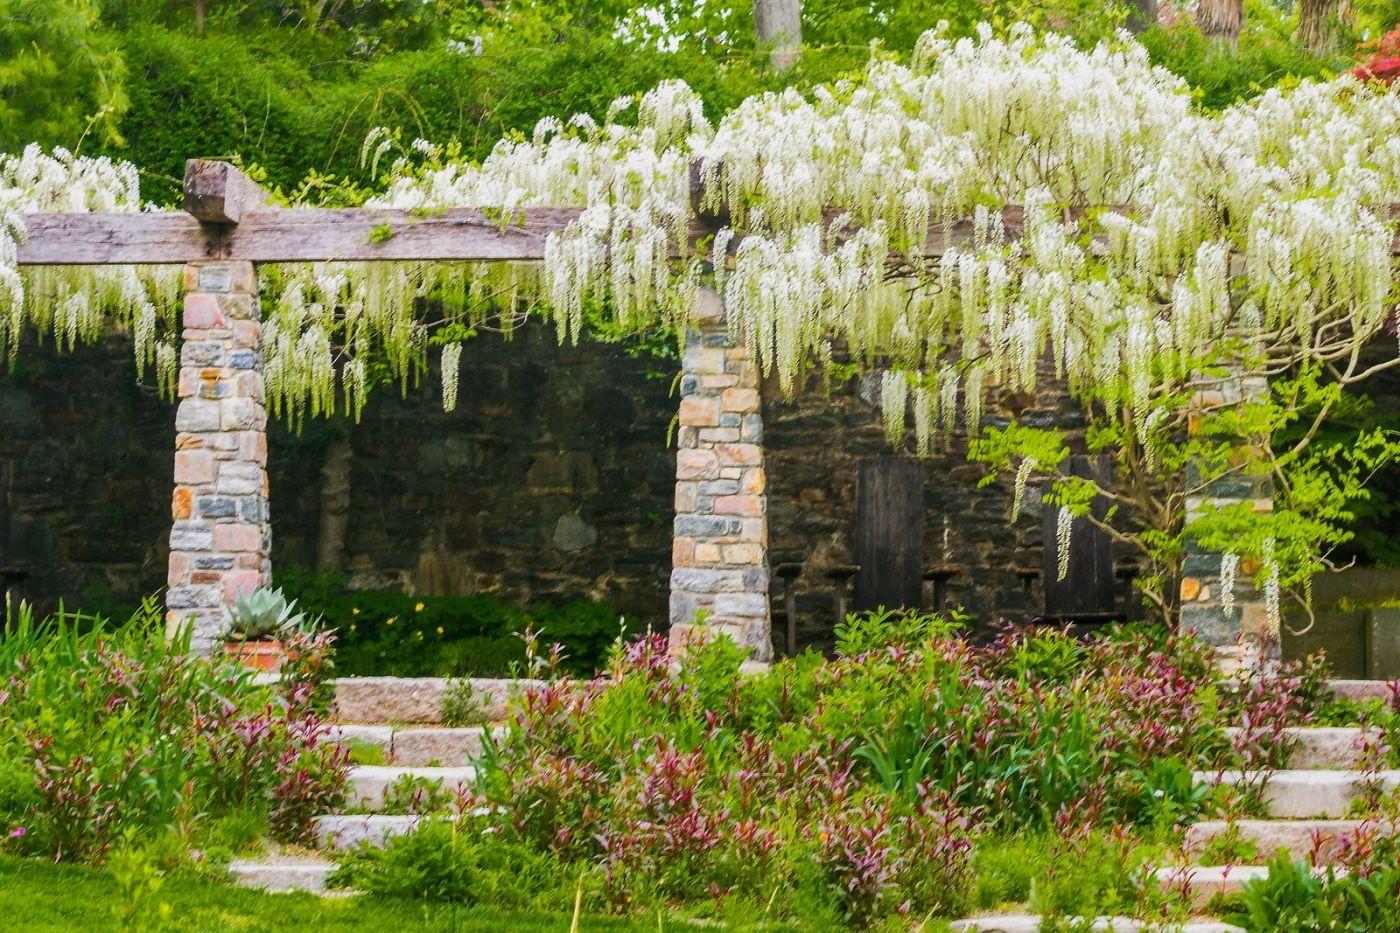 Chanticleer花园,那年盛开的紫藤花_图1-36